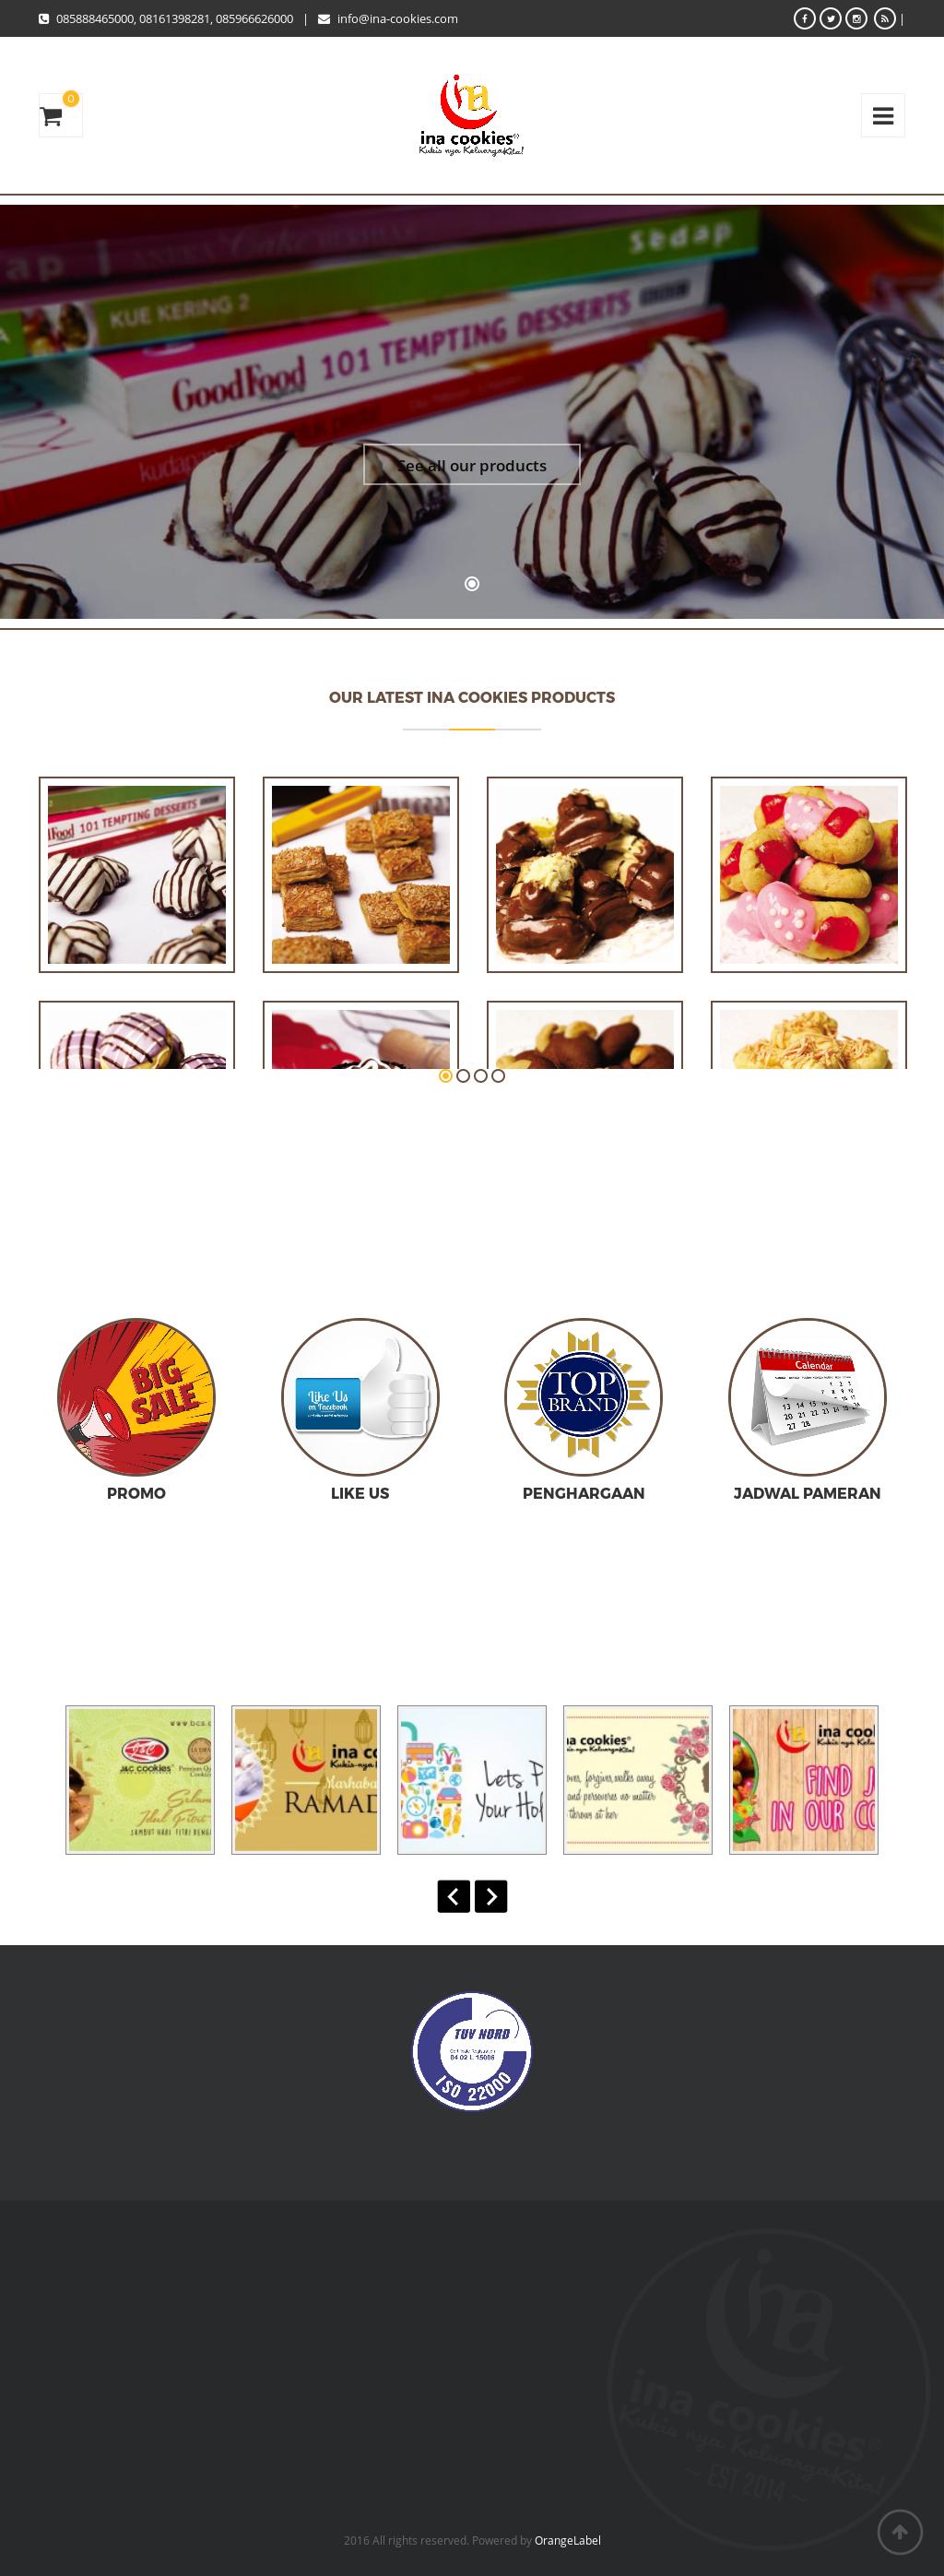 Jual Ina Cookies Terbaru 2018 Proton Exora Karpet Mobil Comfort Deluxe 12mm Car Mat Full Set Competitors Revenue And Employees Owler Company Profile Cookiess Website Screenshot On Jun 2017